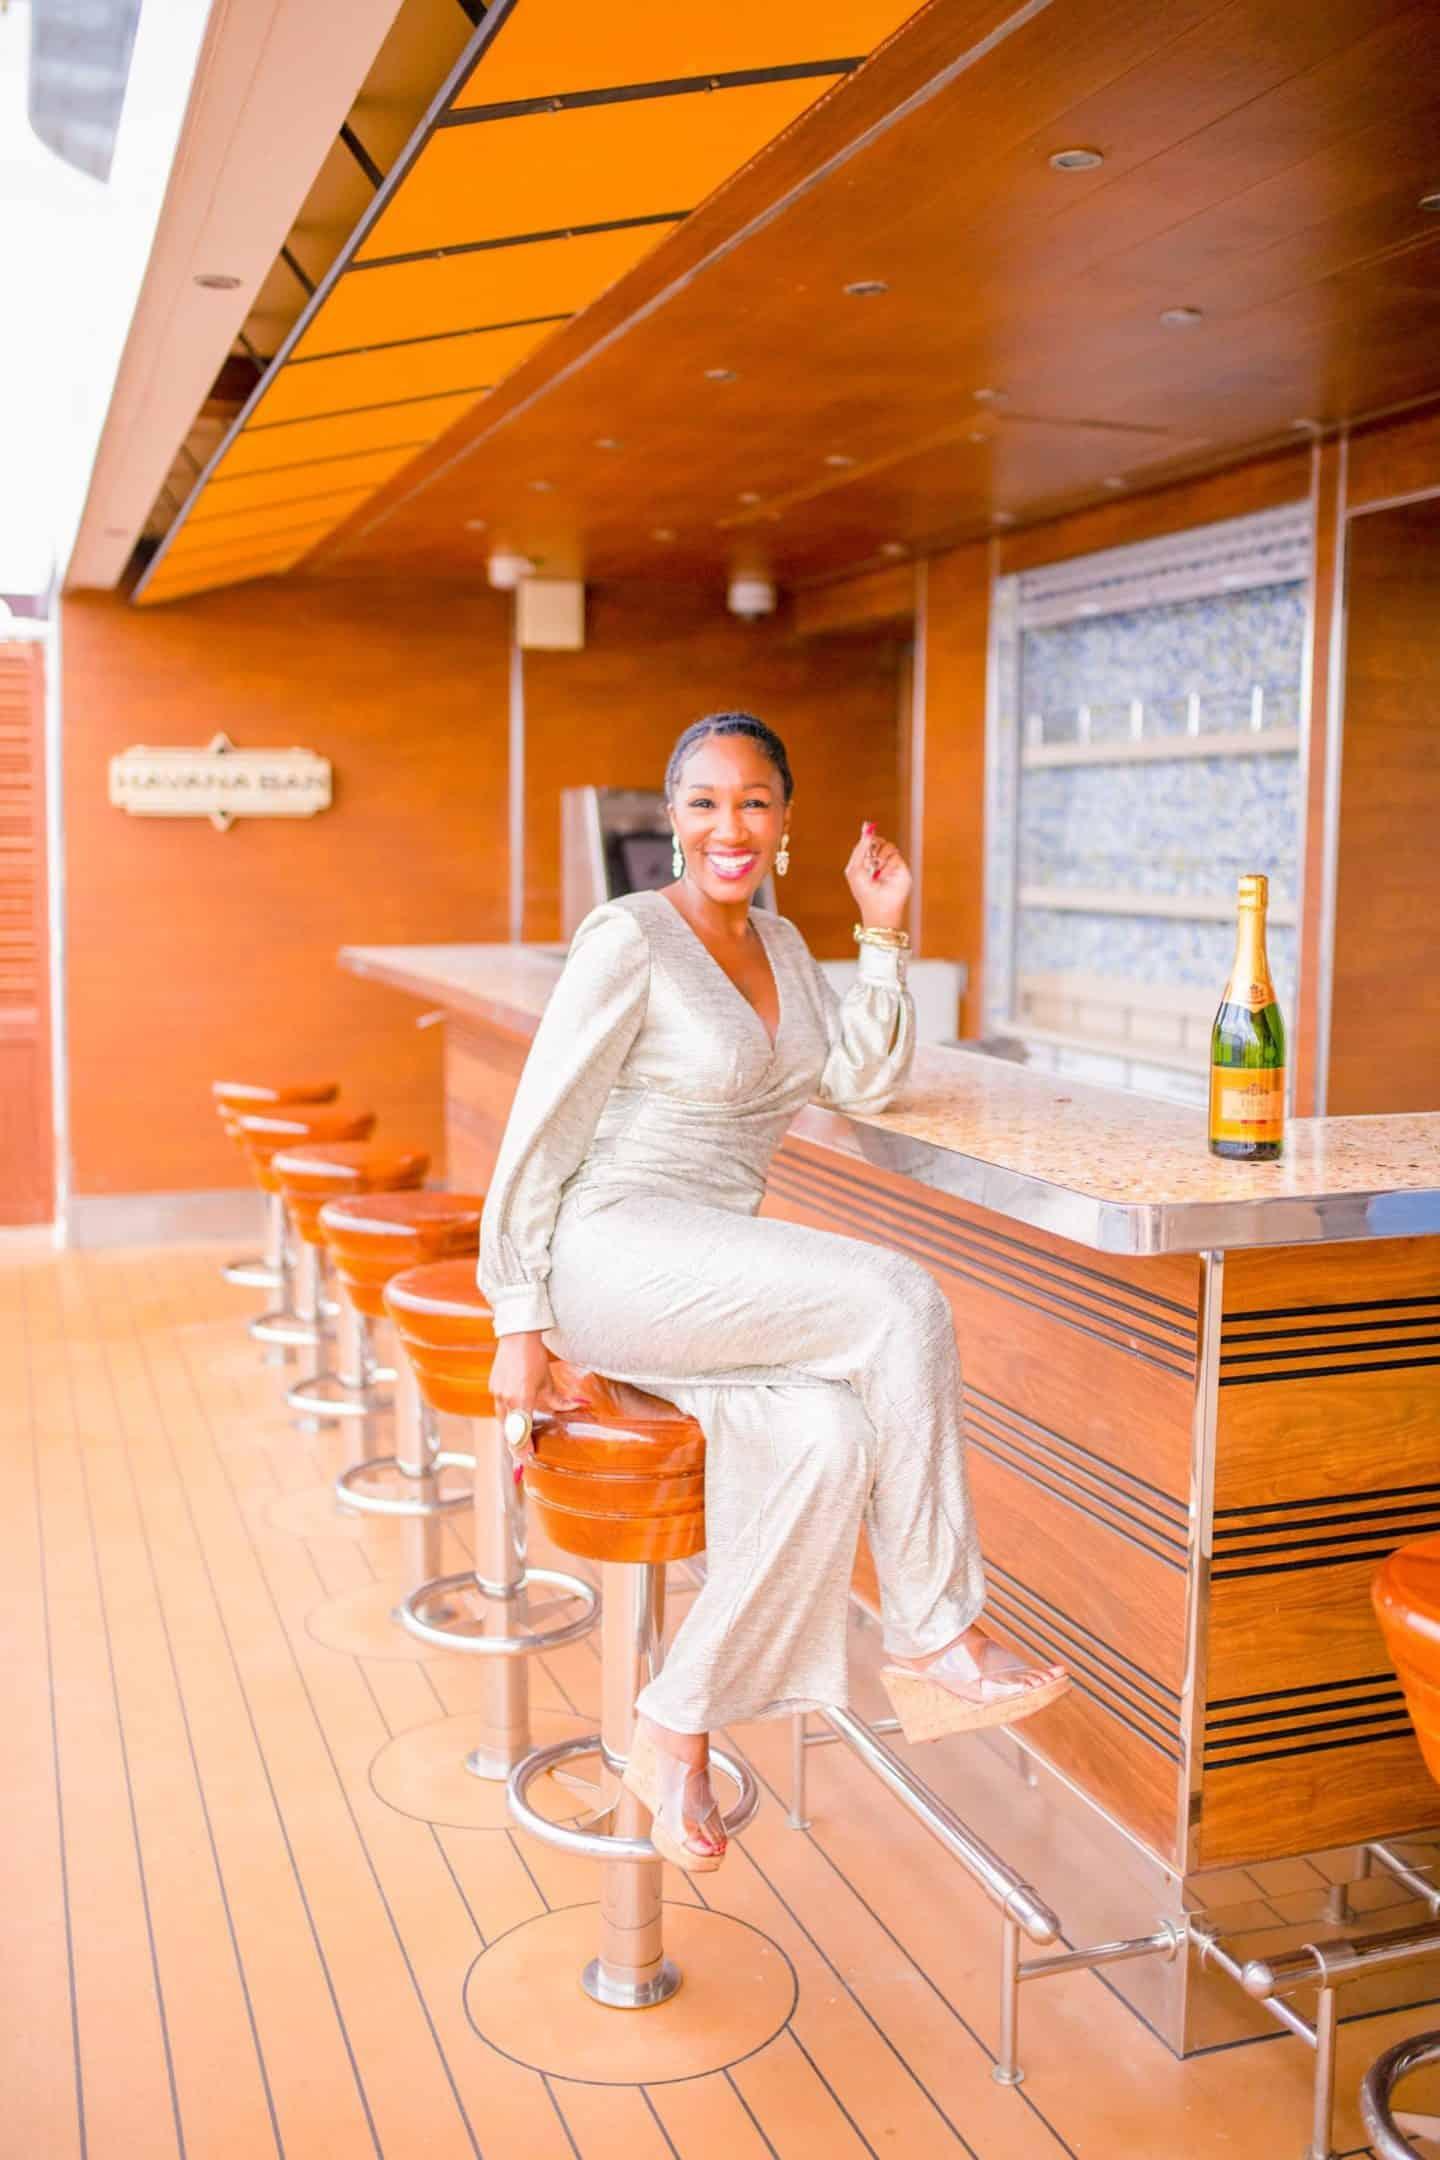 Adrianna Papell All Occasion Affordable Designer Dresses | Shaunda Necole